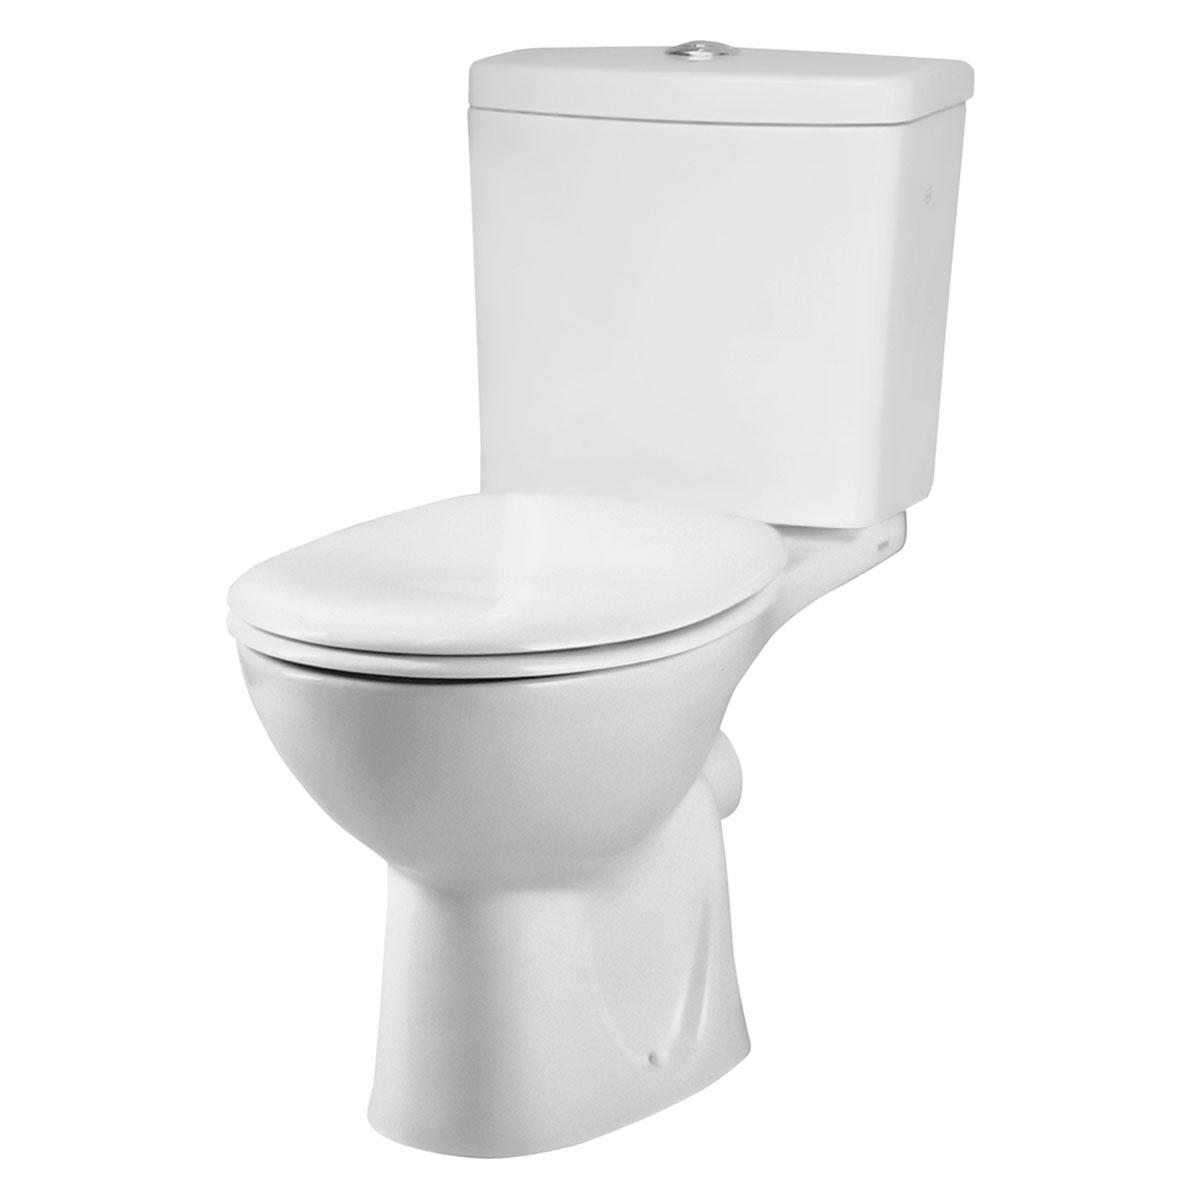 VitrA Layton Value Suite Close Coupled Toilet 2 Tap Hole Basin-1